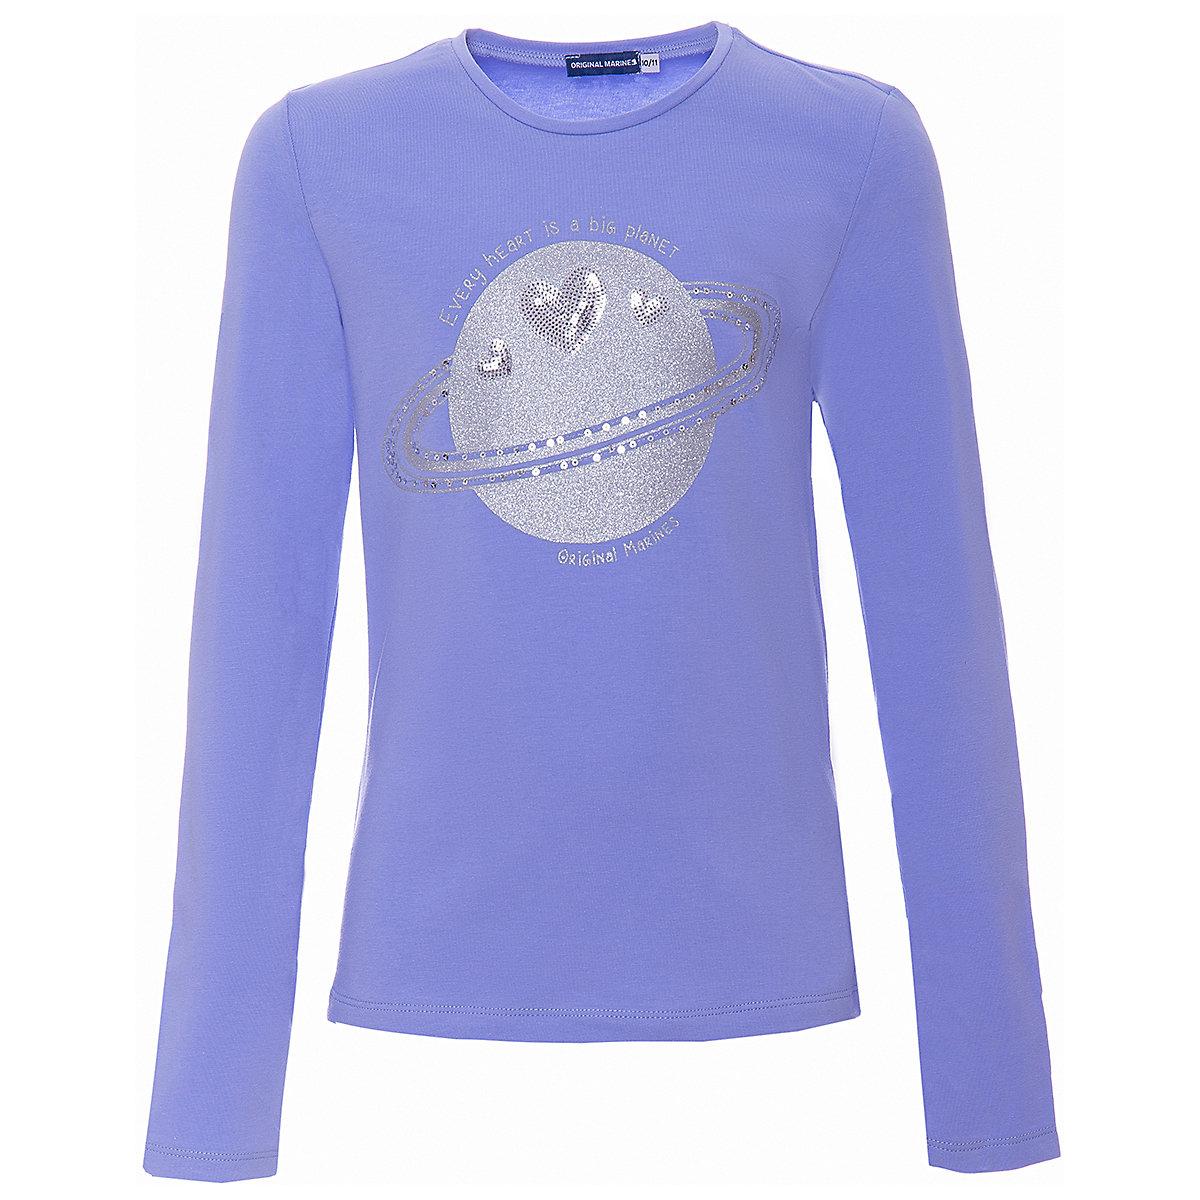 Original Marines Hoodies & Sweatshirts 9501119 Cotton Girls Casual children clothing girl hoodies